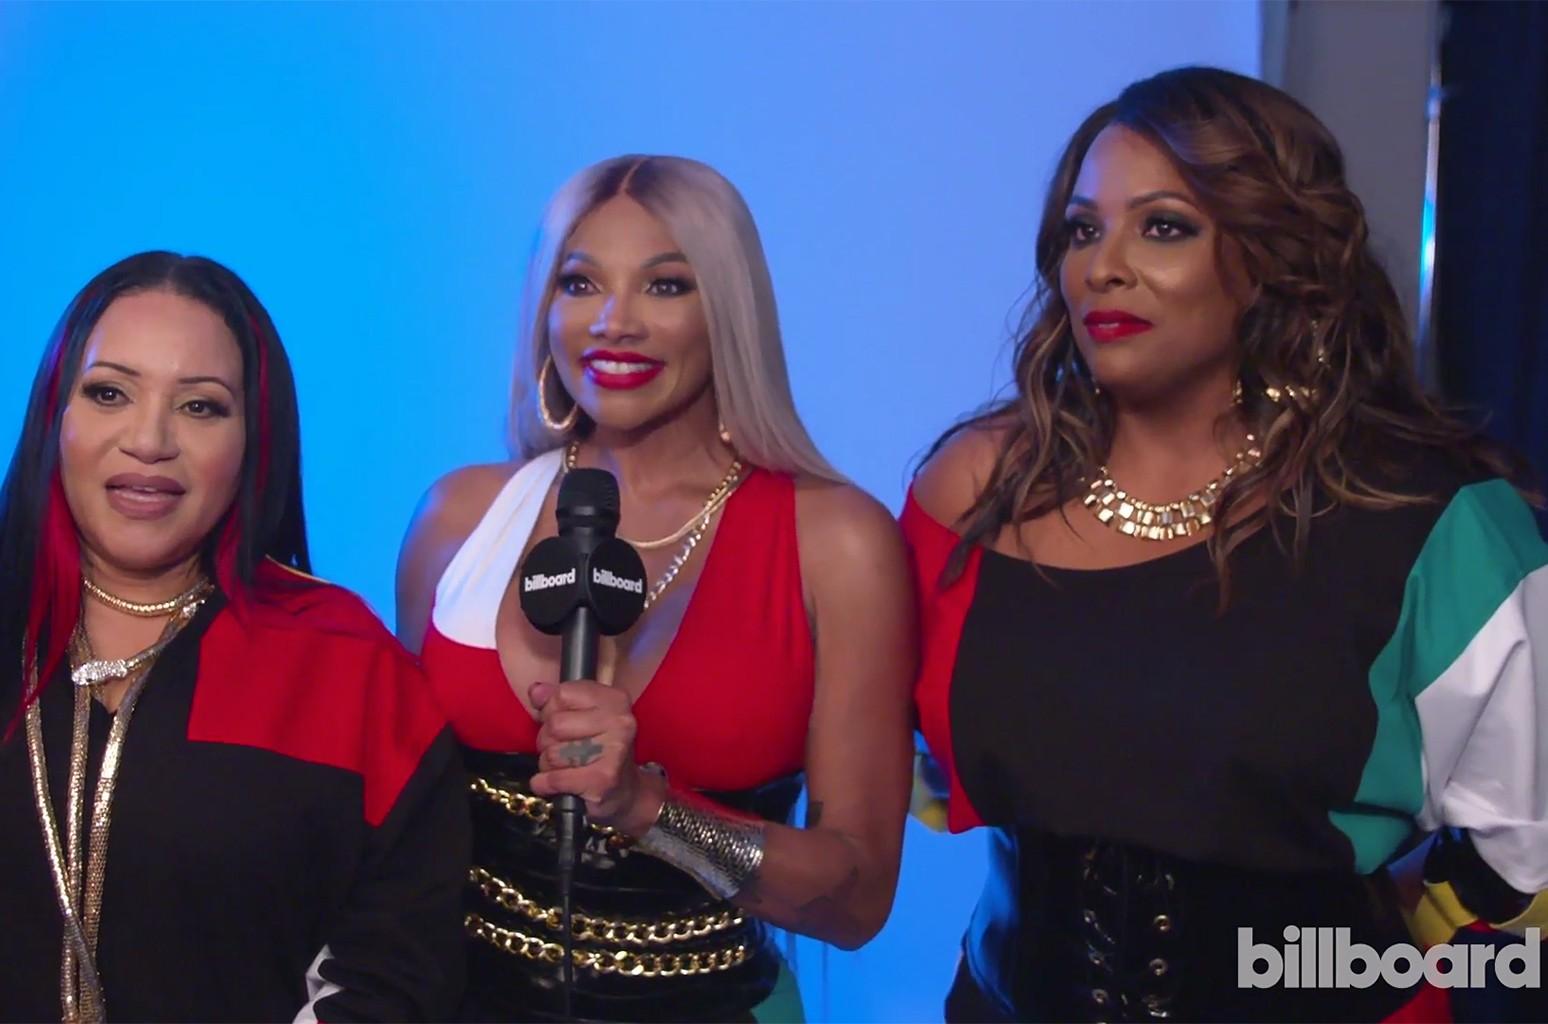 Salt N Pepa At Billboard Music Awards It S Amazing To Know That You Made Timeless Music Billboard Billboard